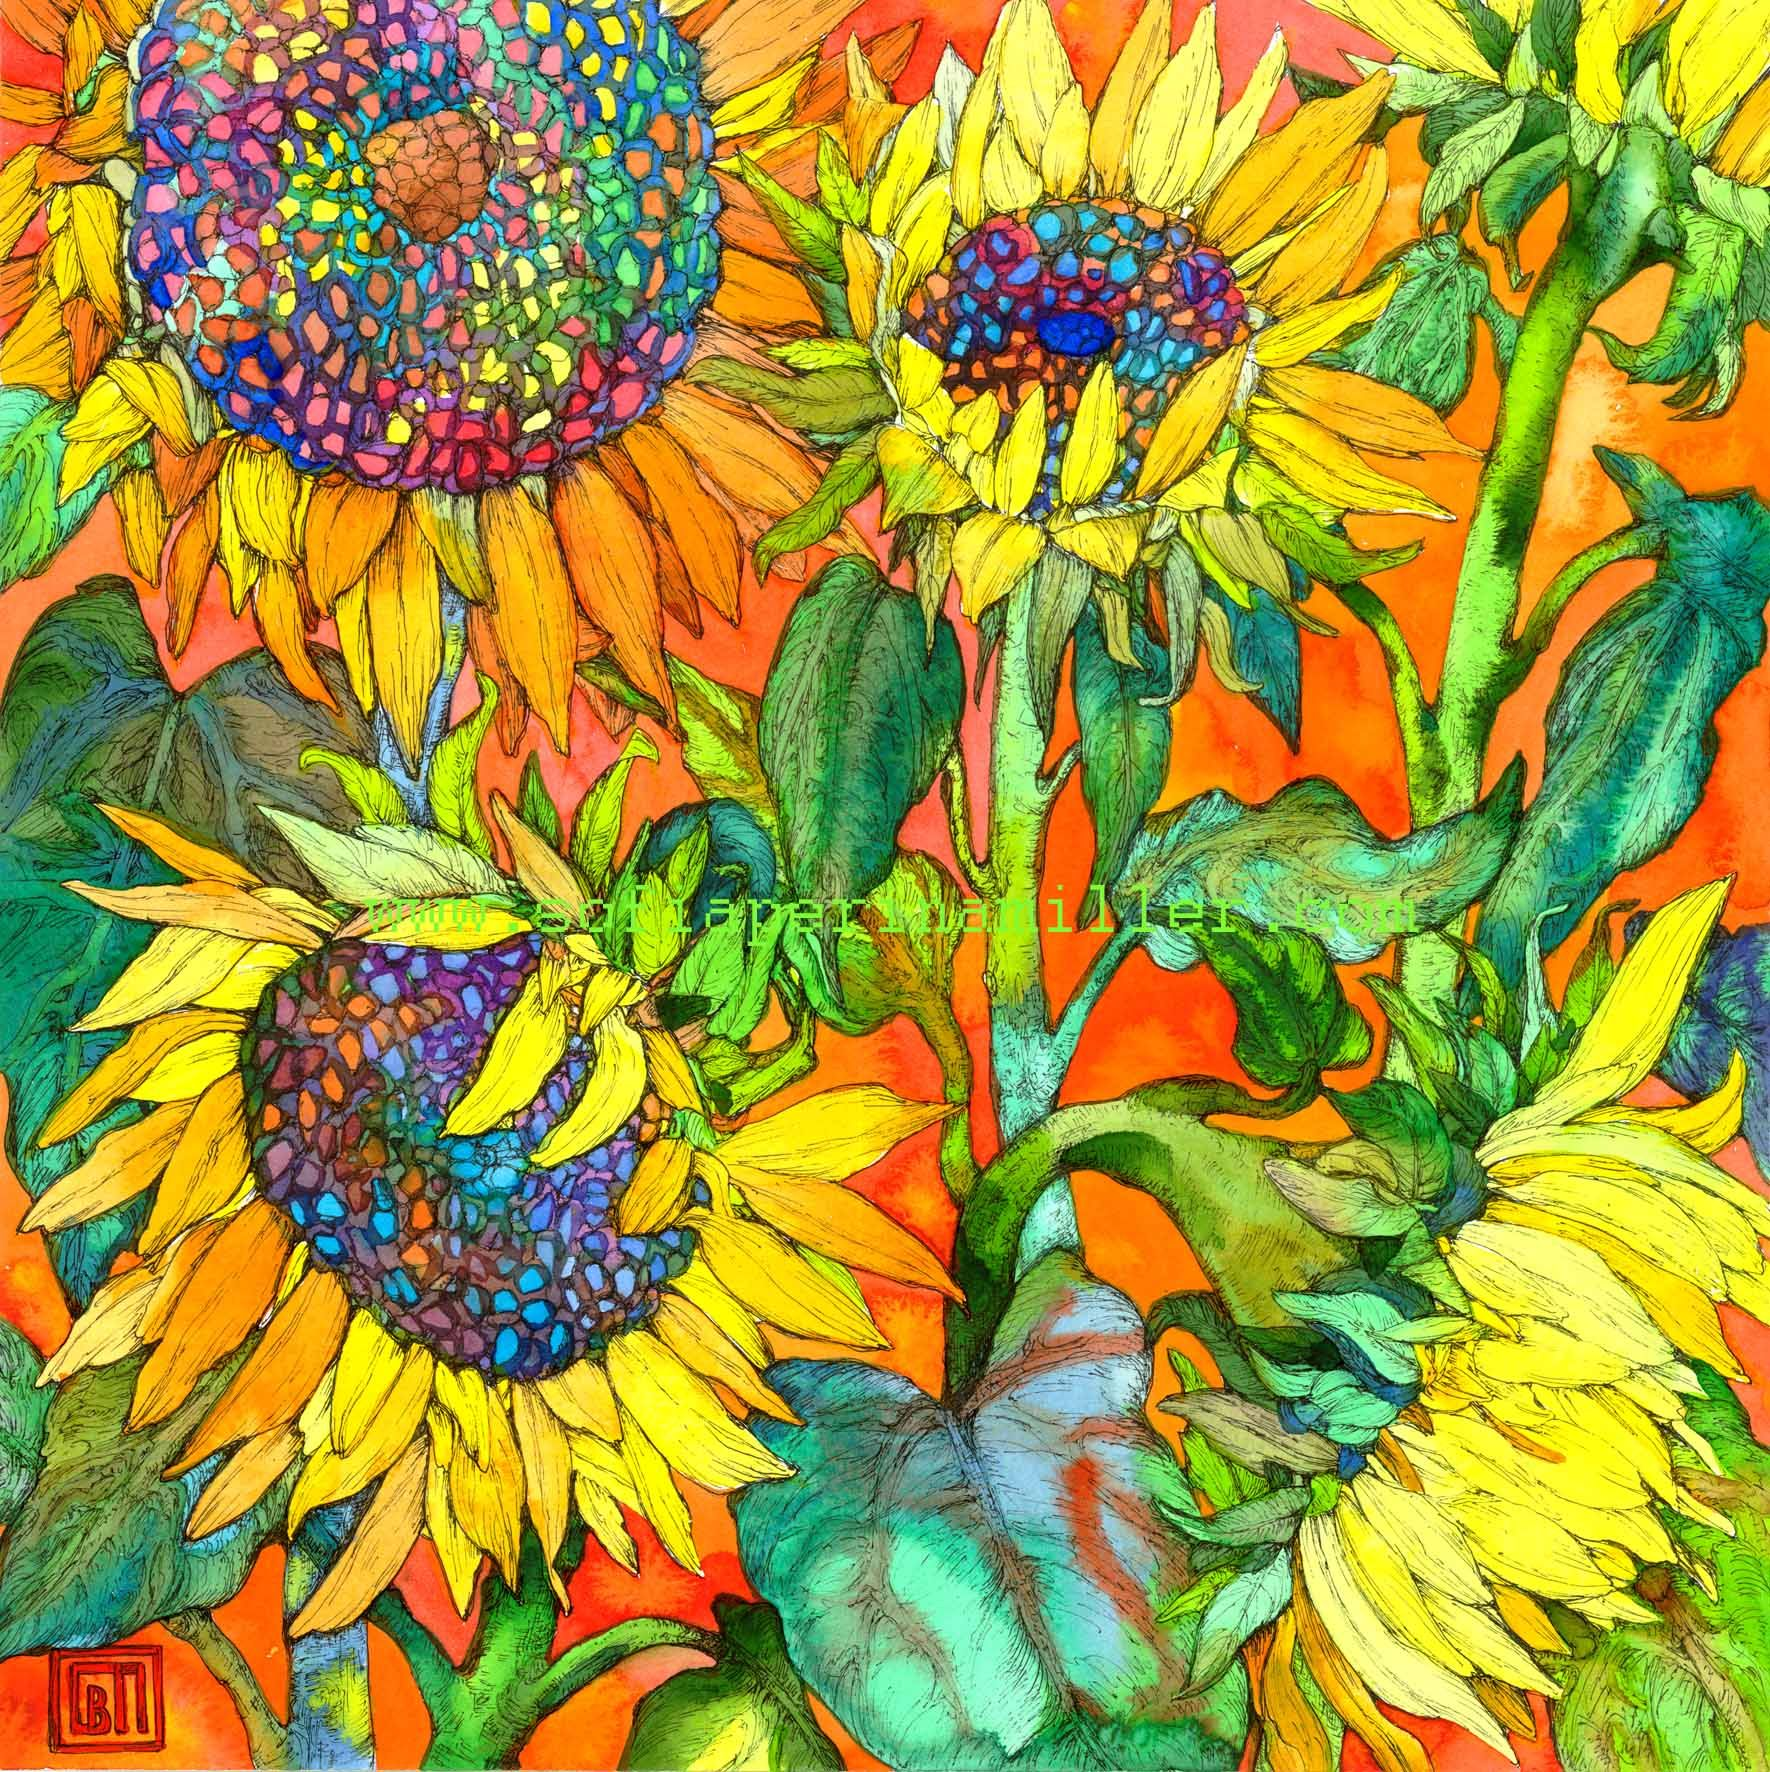 Sunflowersg. Sofia Perina Miller